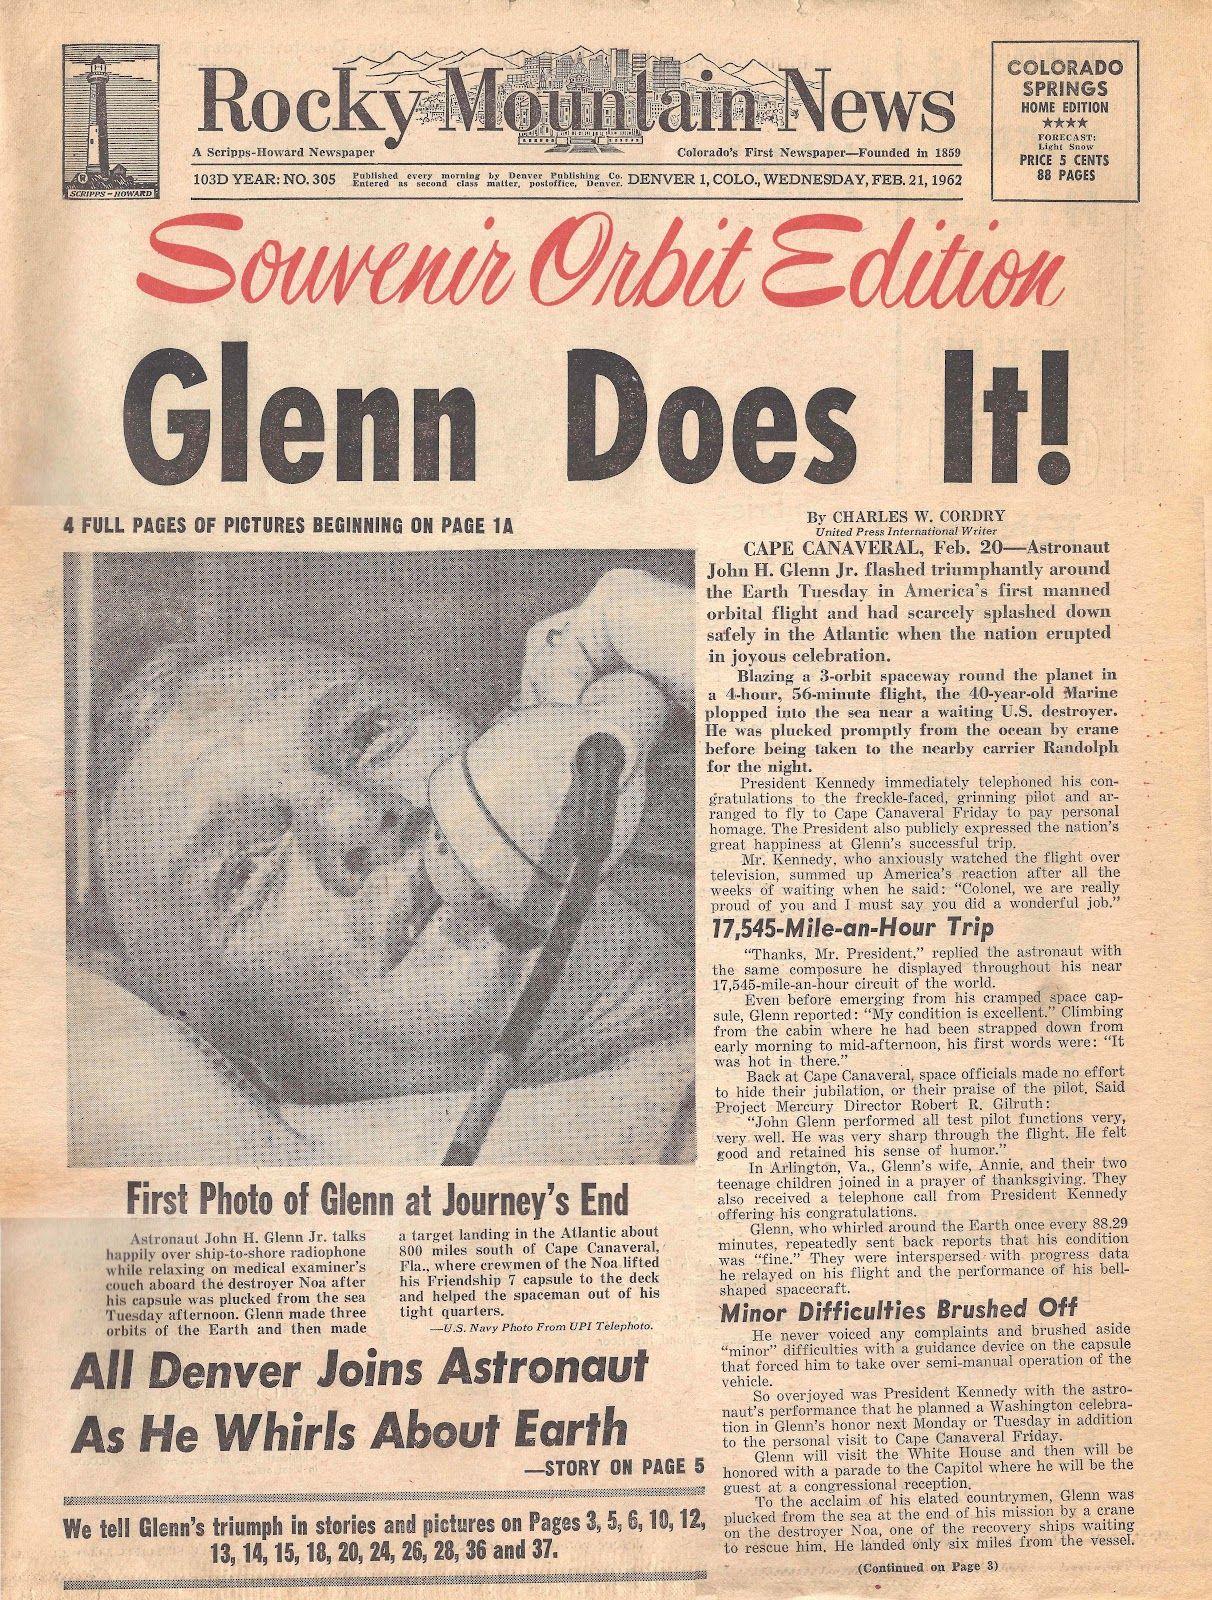 February 20 1962 John Glenn became the first American to orbit